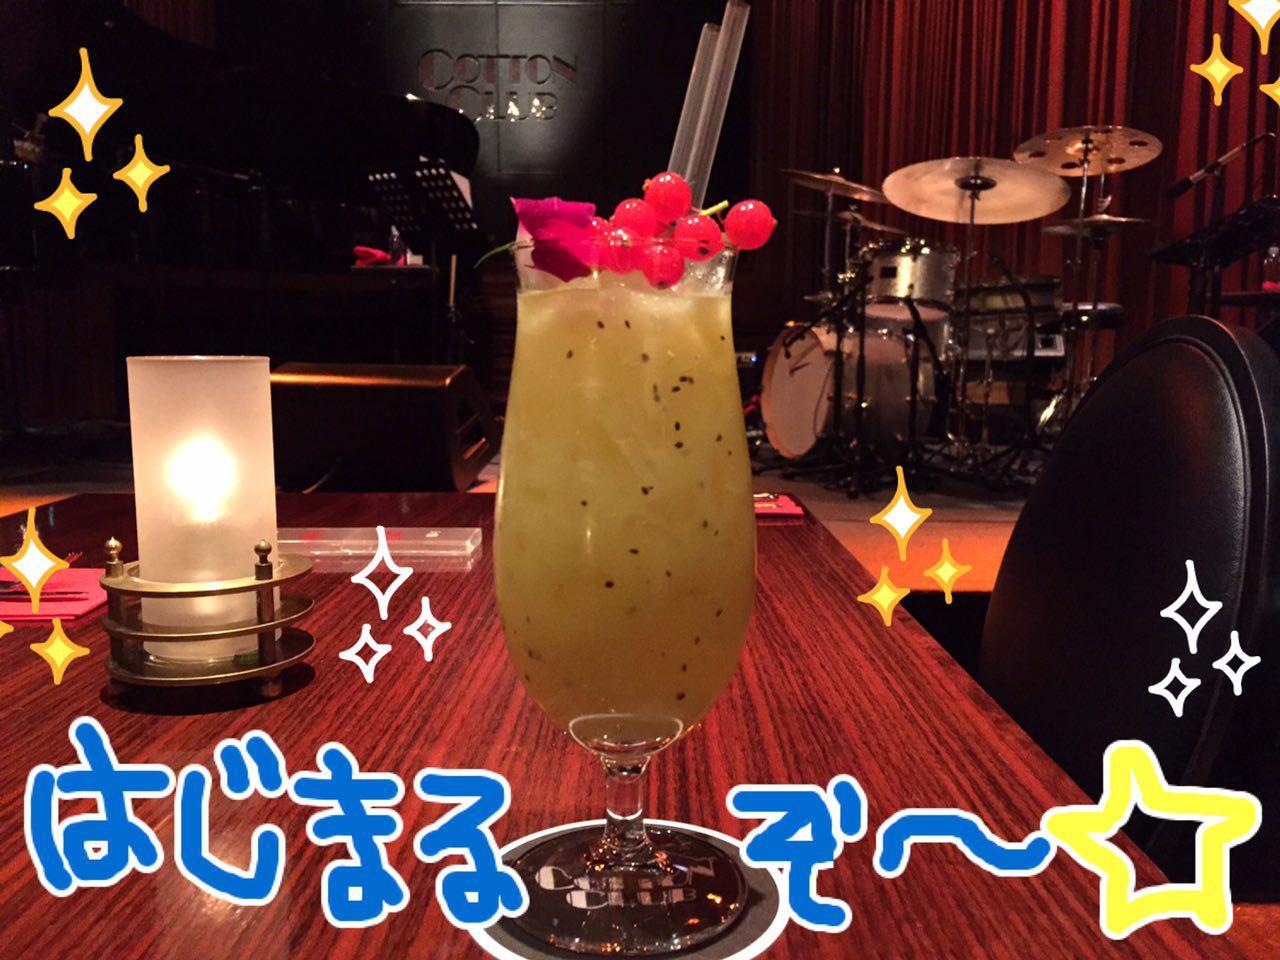 photo_2017-02-22_01-24-19.jpg